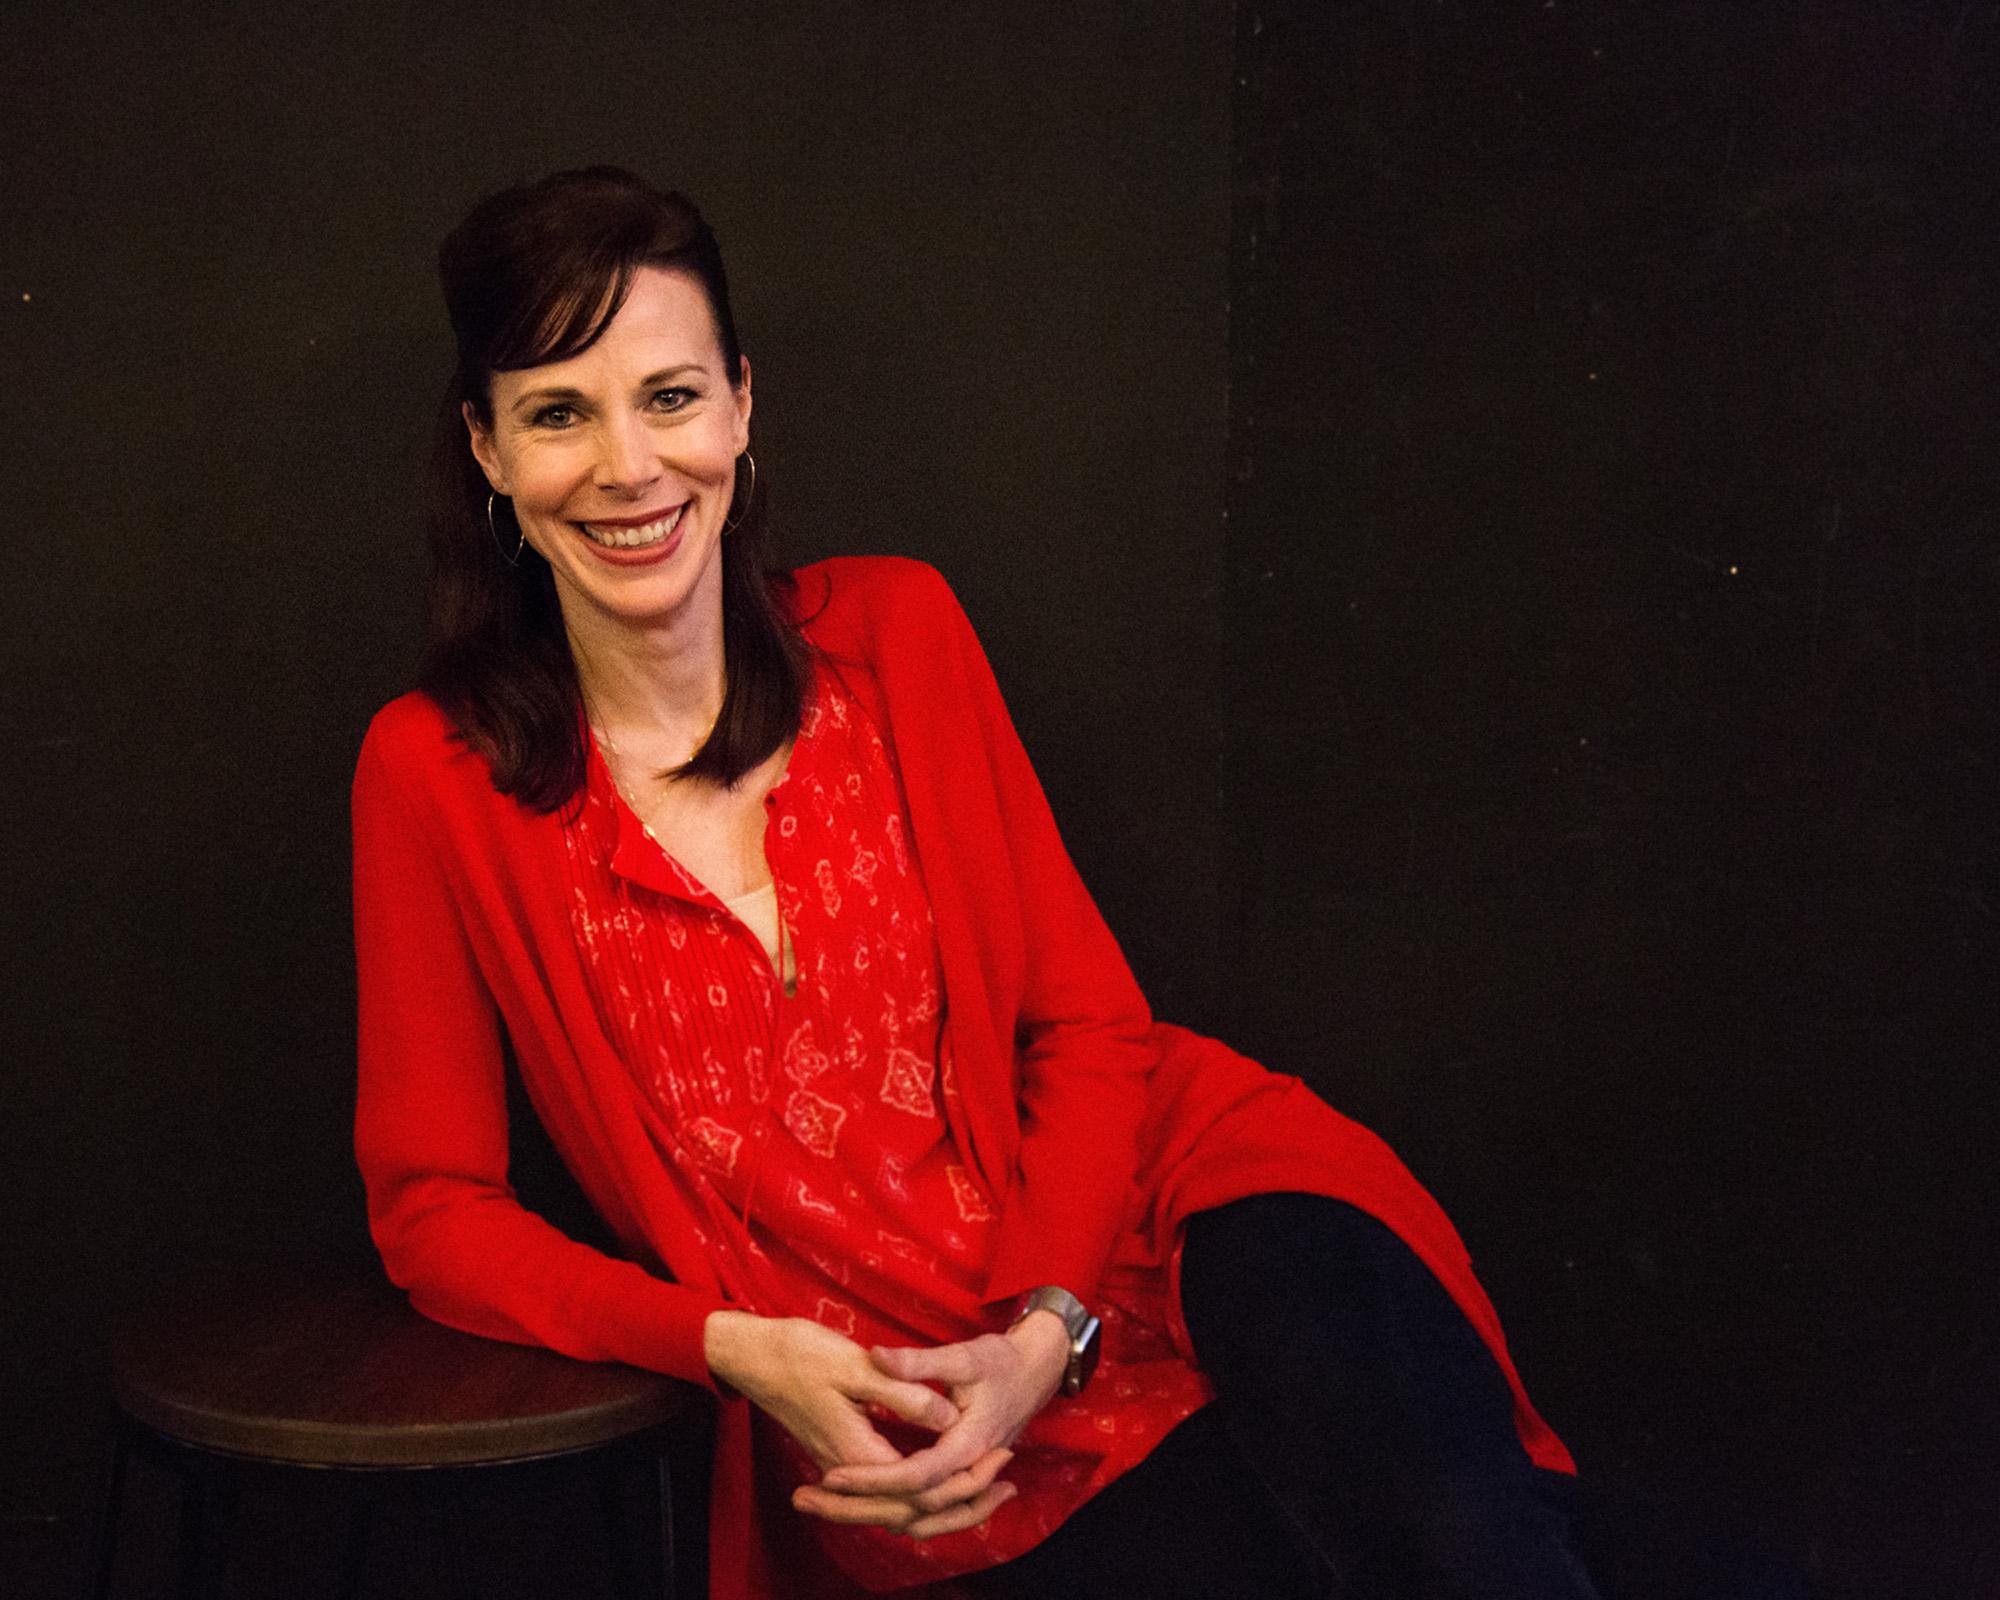 Christa Scott-Reed